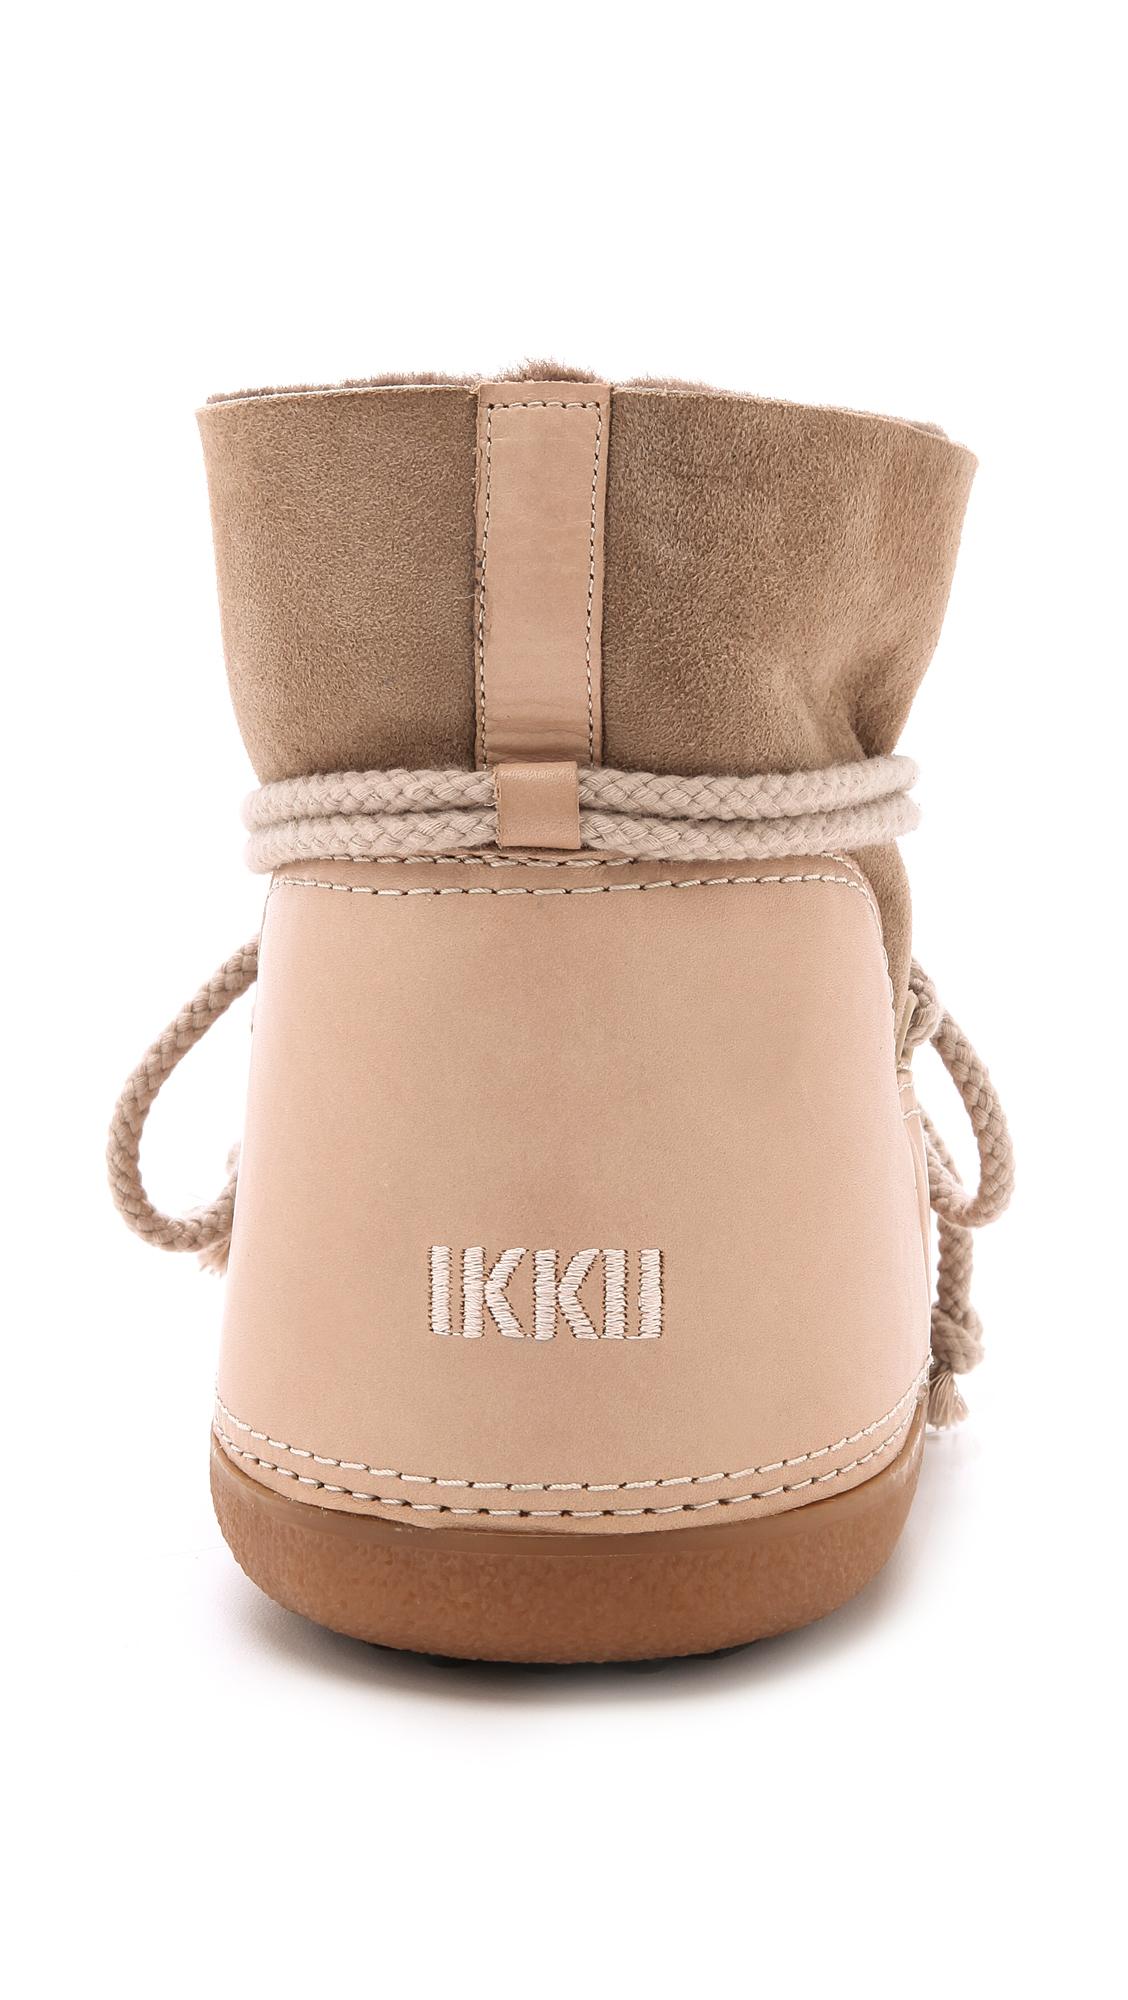 Ikkii Leather Ikkii - Cream in Natural